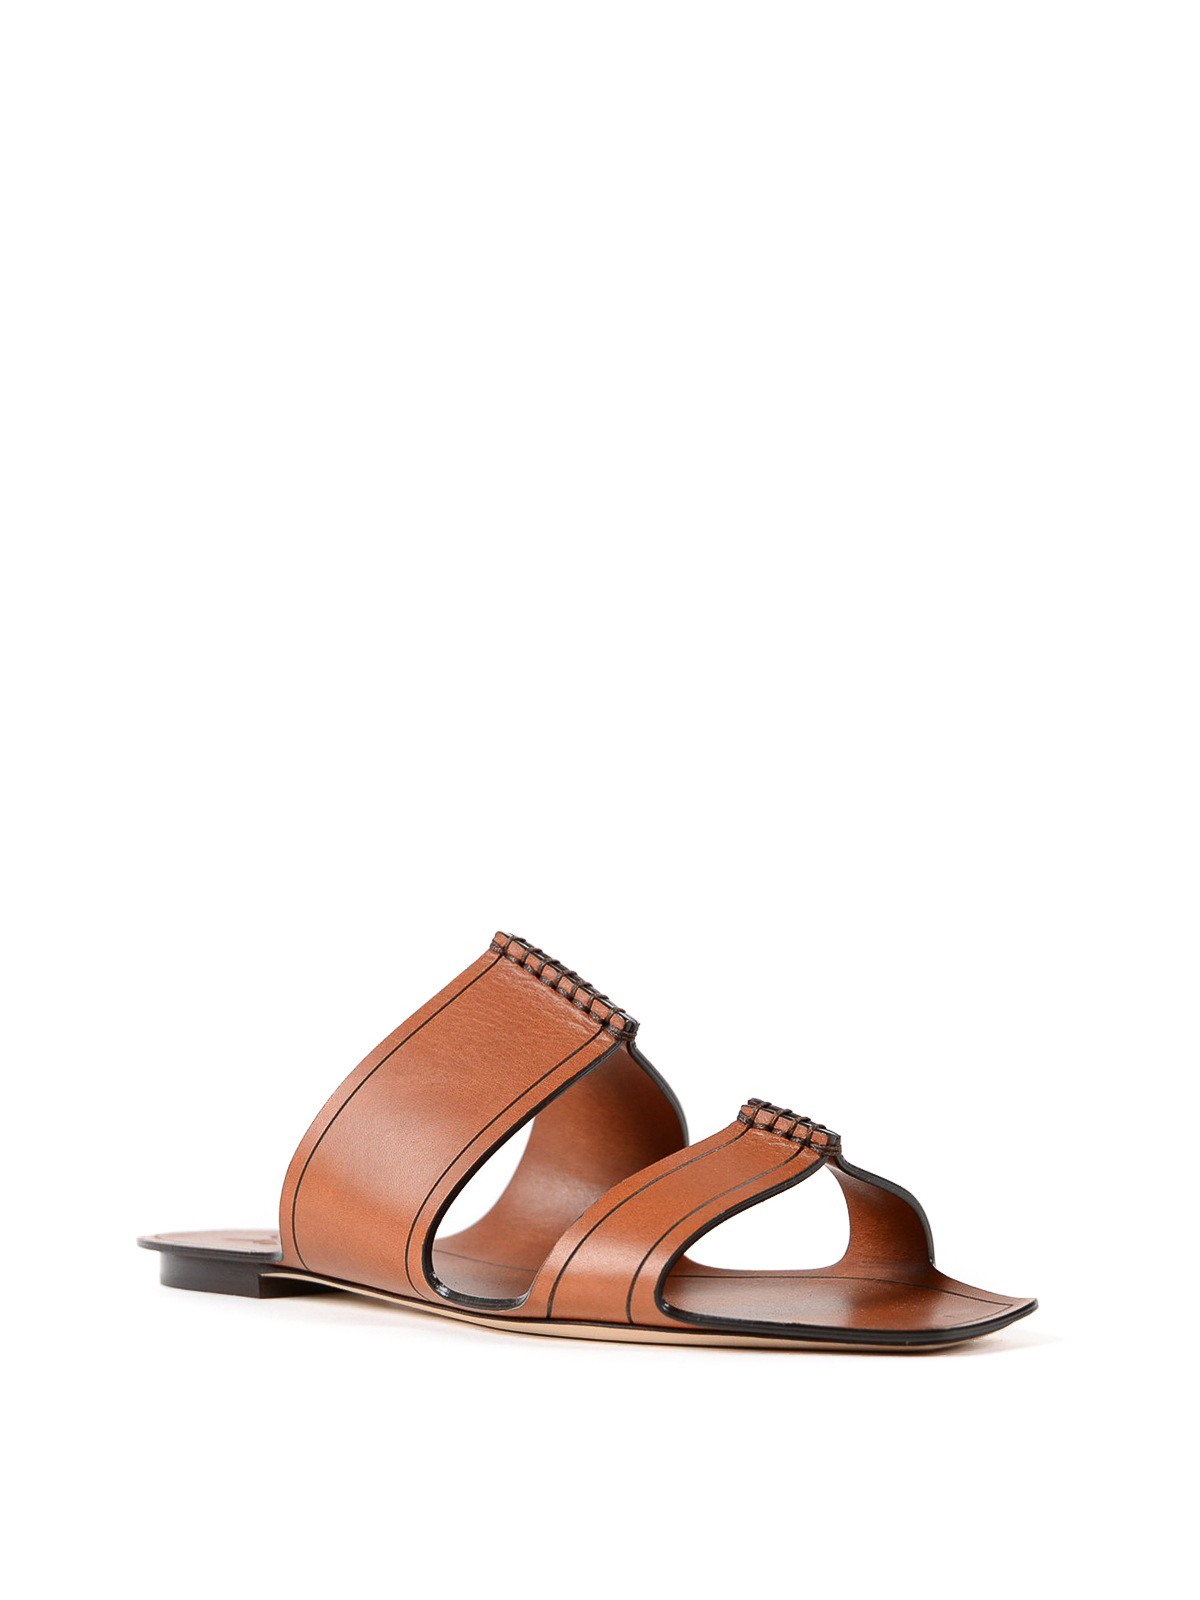 Saint Laurent - Saba flat leather